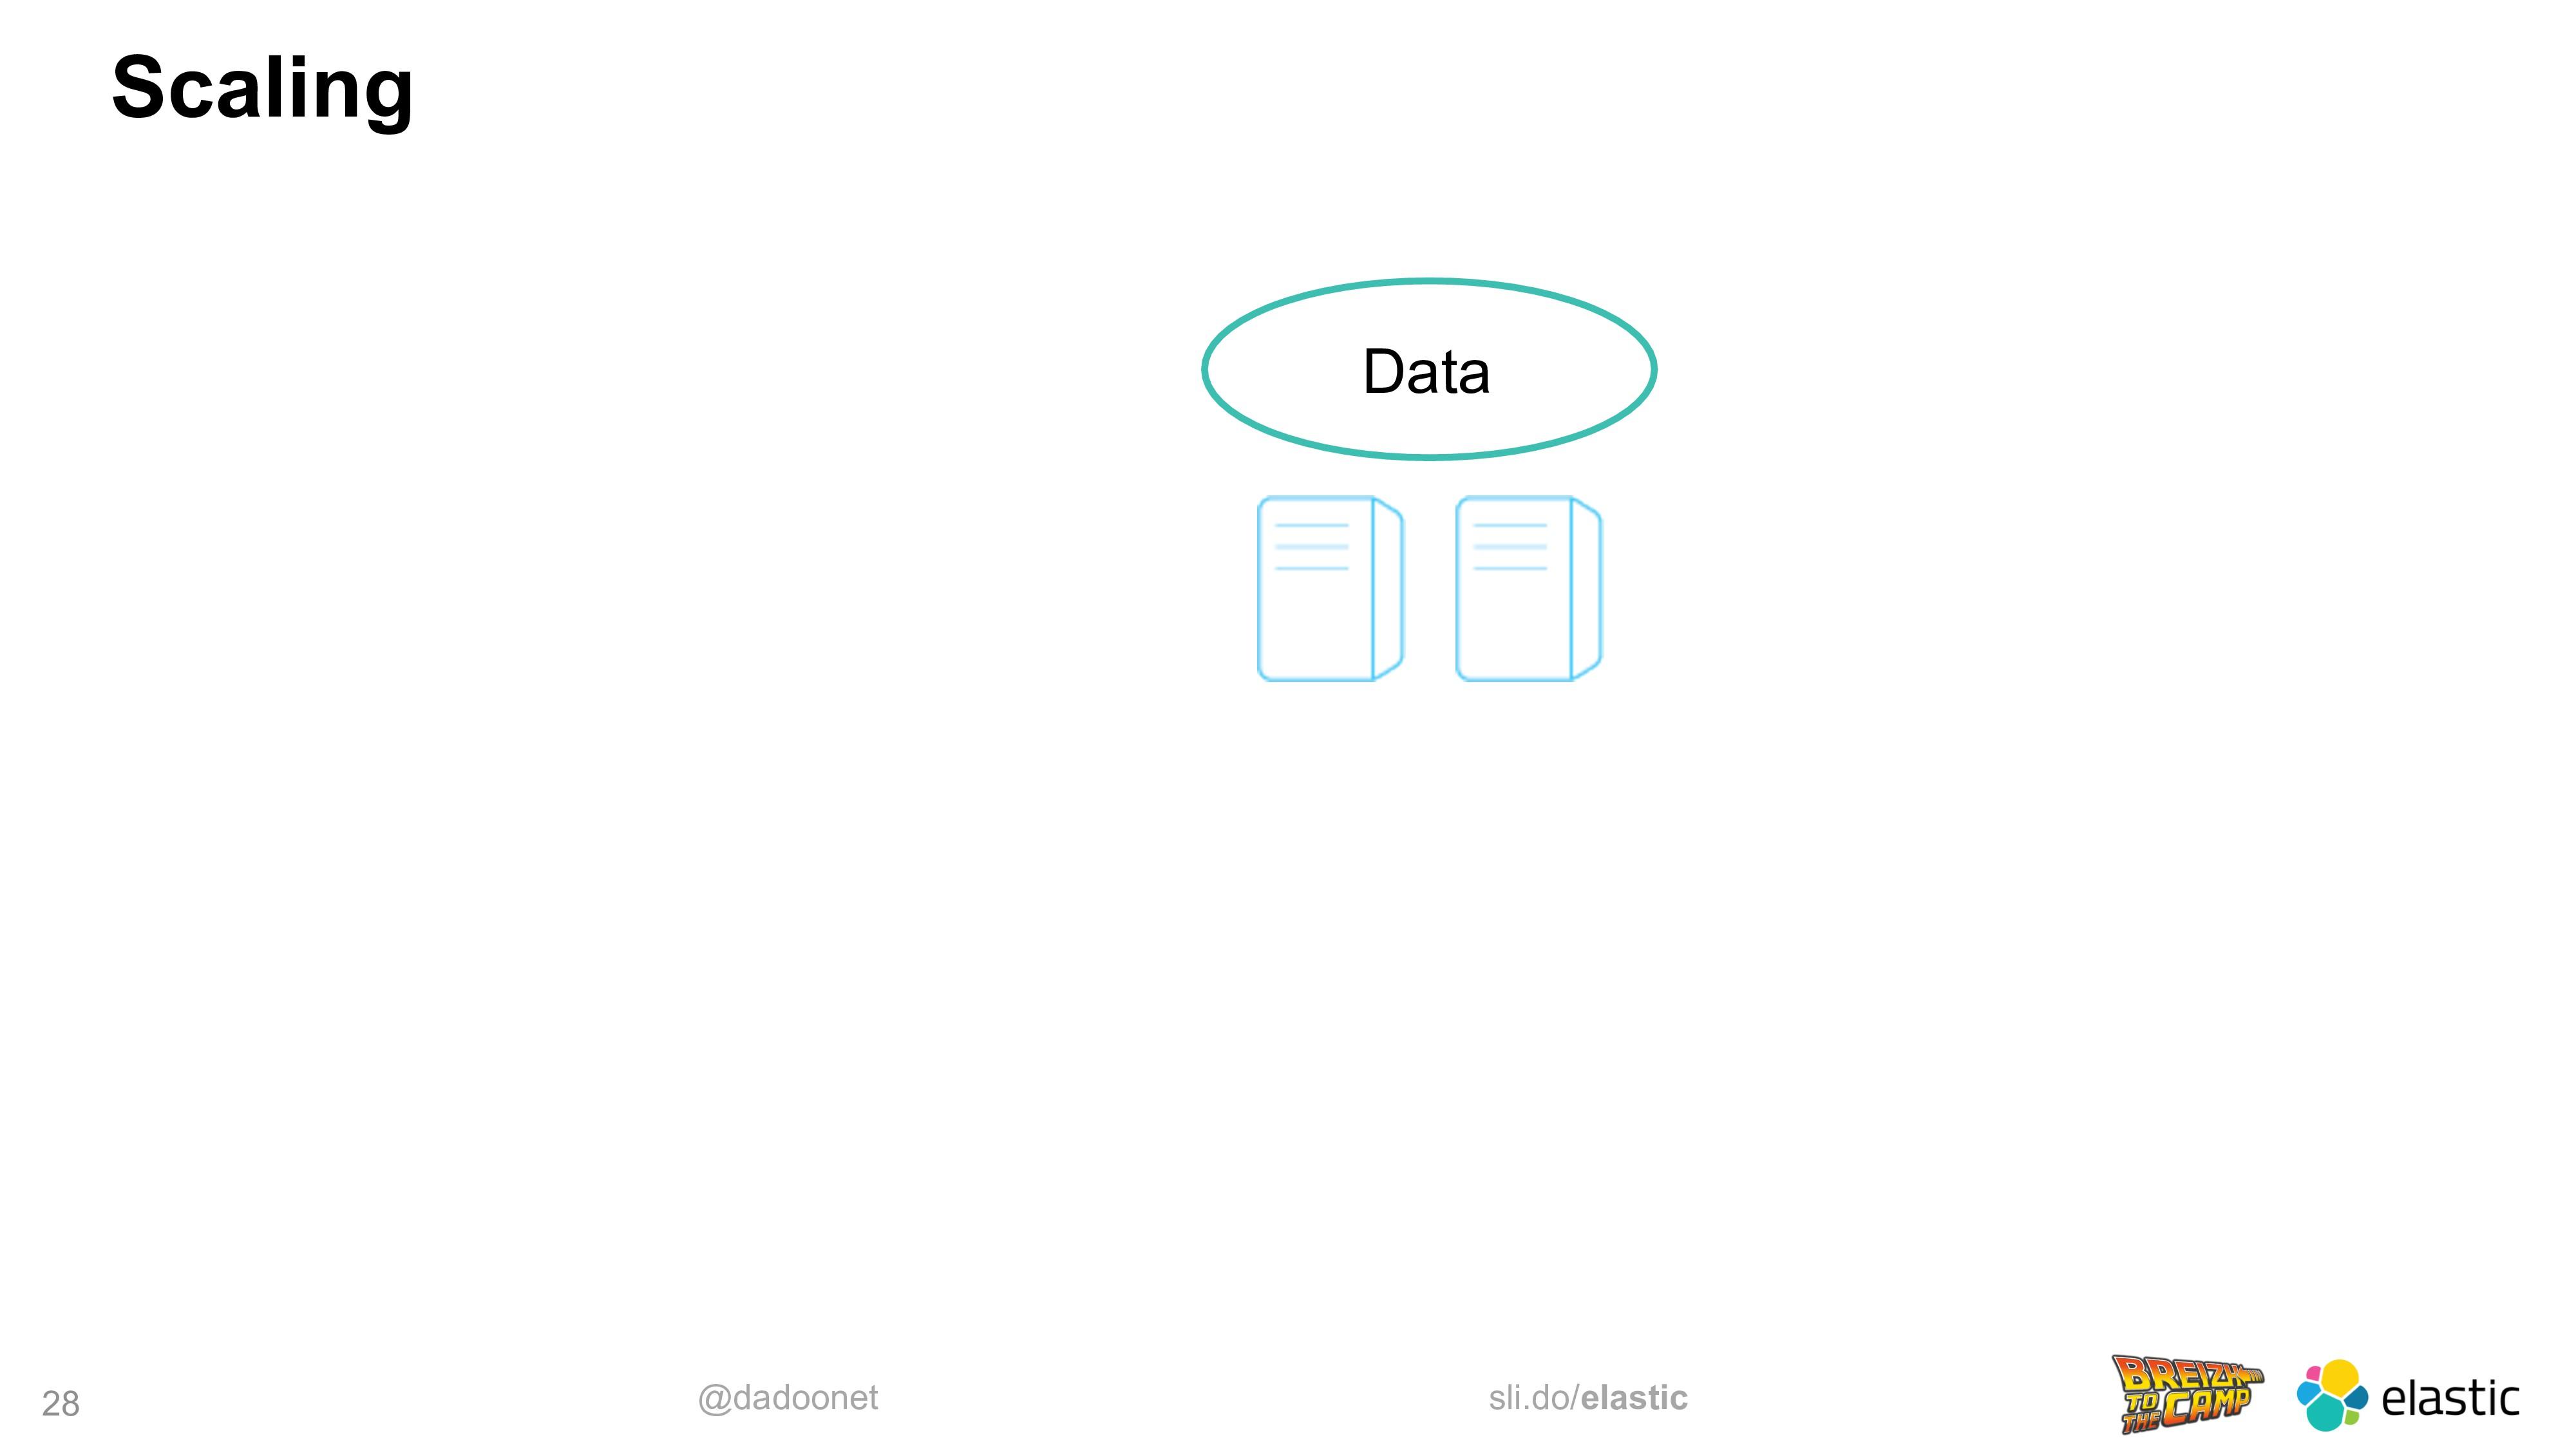 @dadoonet sli.do/elastic 28 Scaling Data